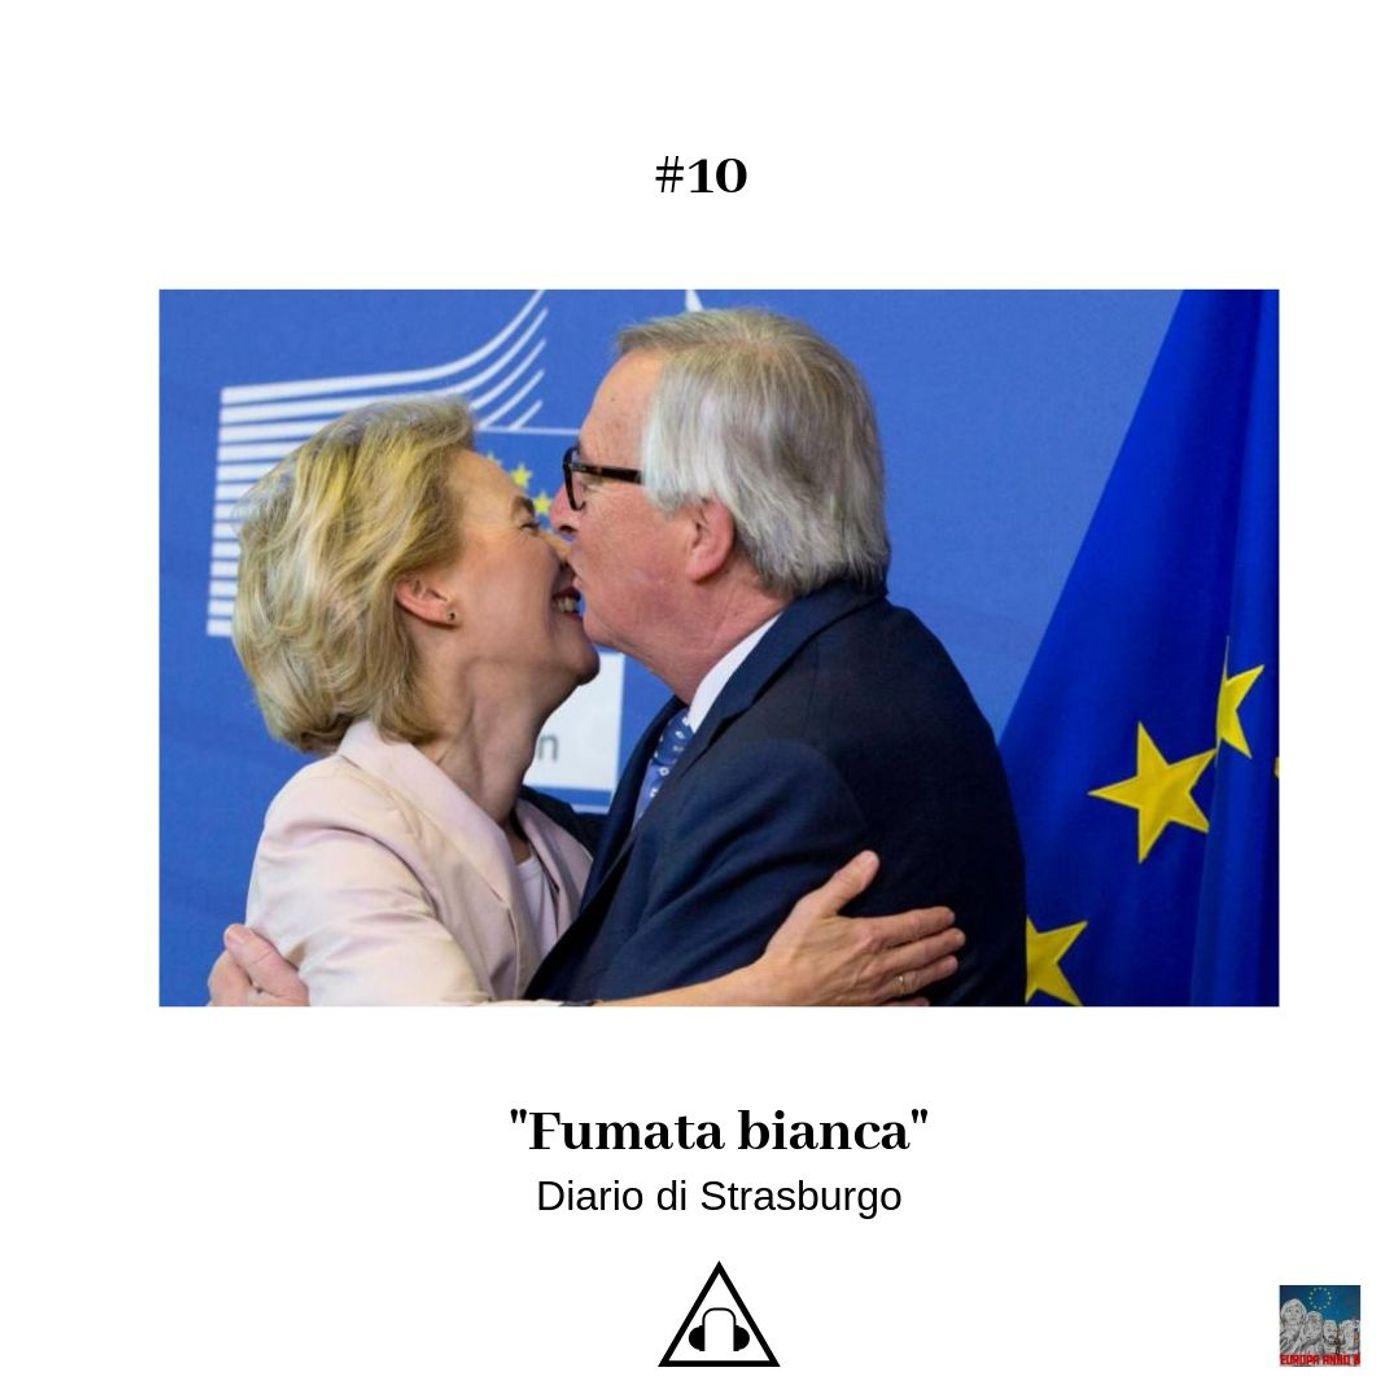 Ep. 10 I Fumata bianca - Diario di Strasburgo